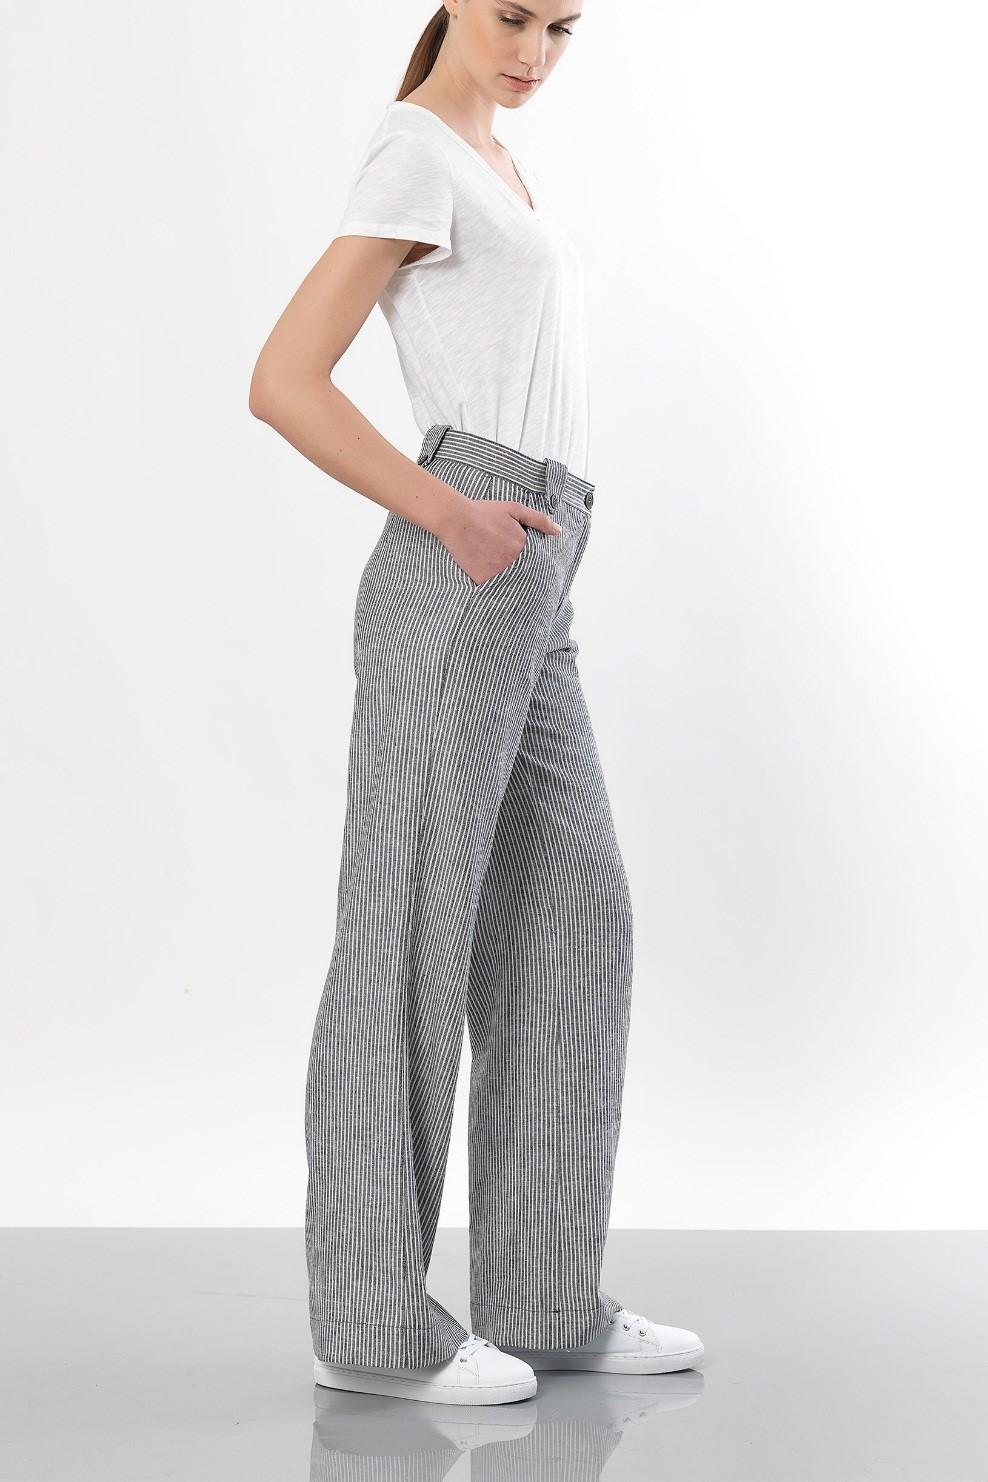 f03ecca1957e Spring Collection στο Bill Cost – Τα γυναικεία ρούχα που όλες ...